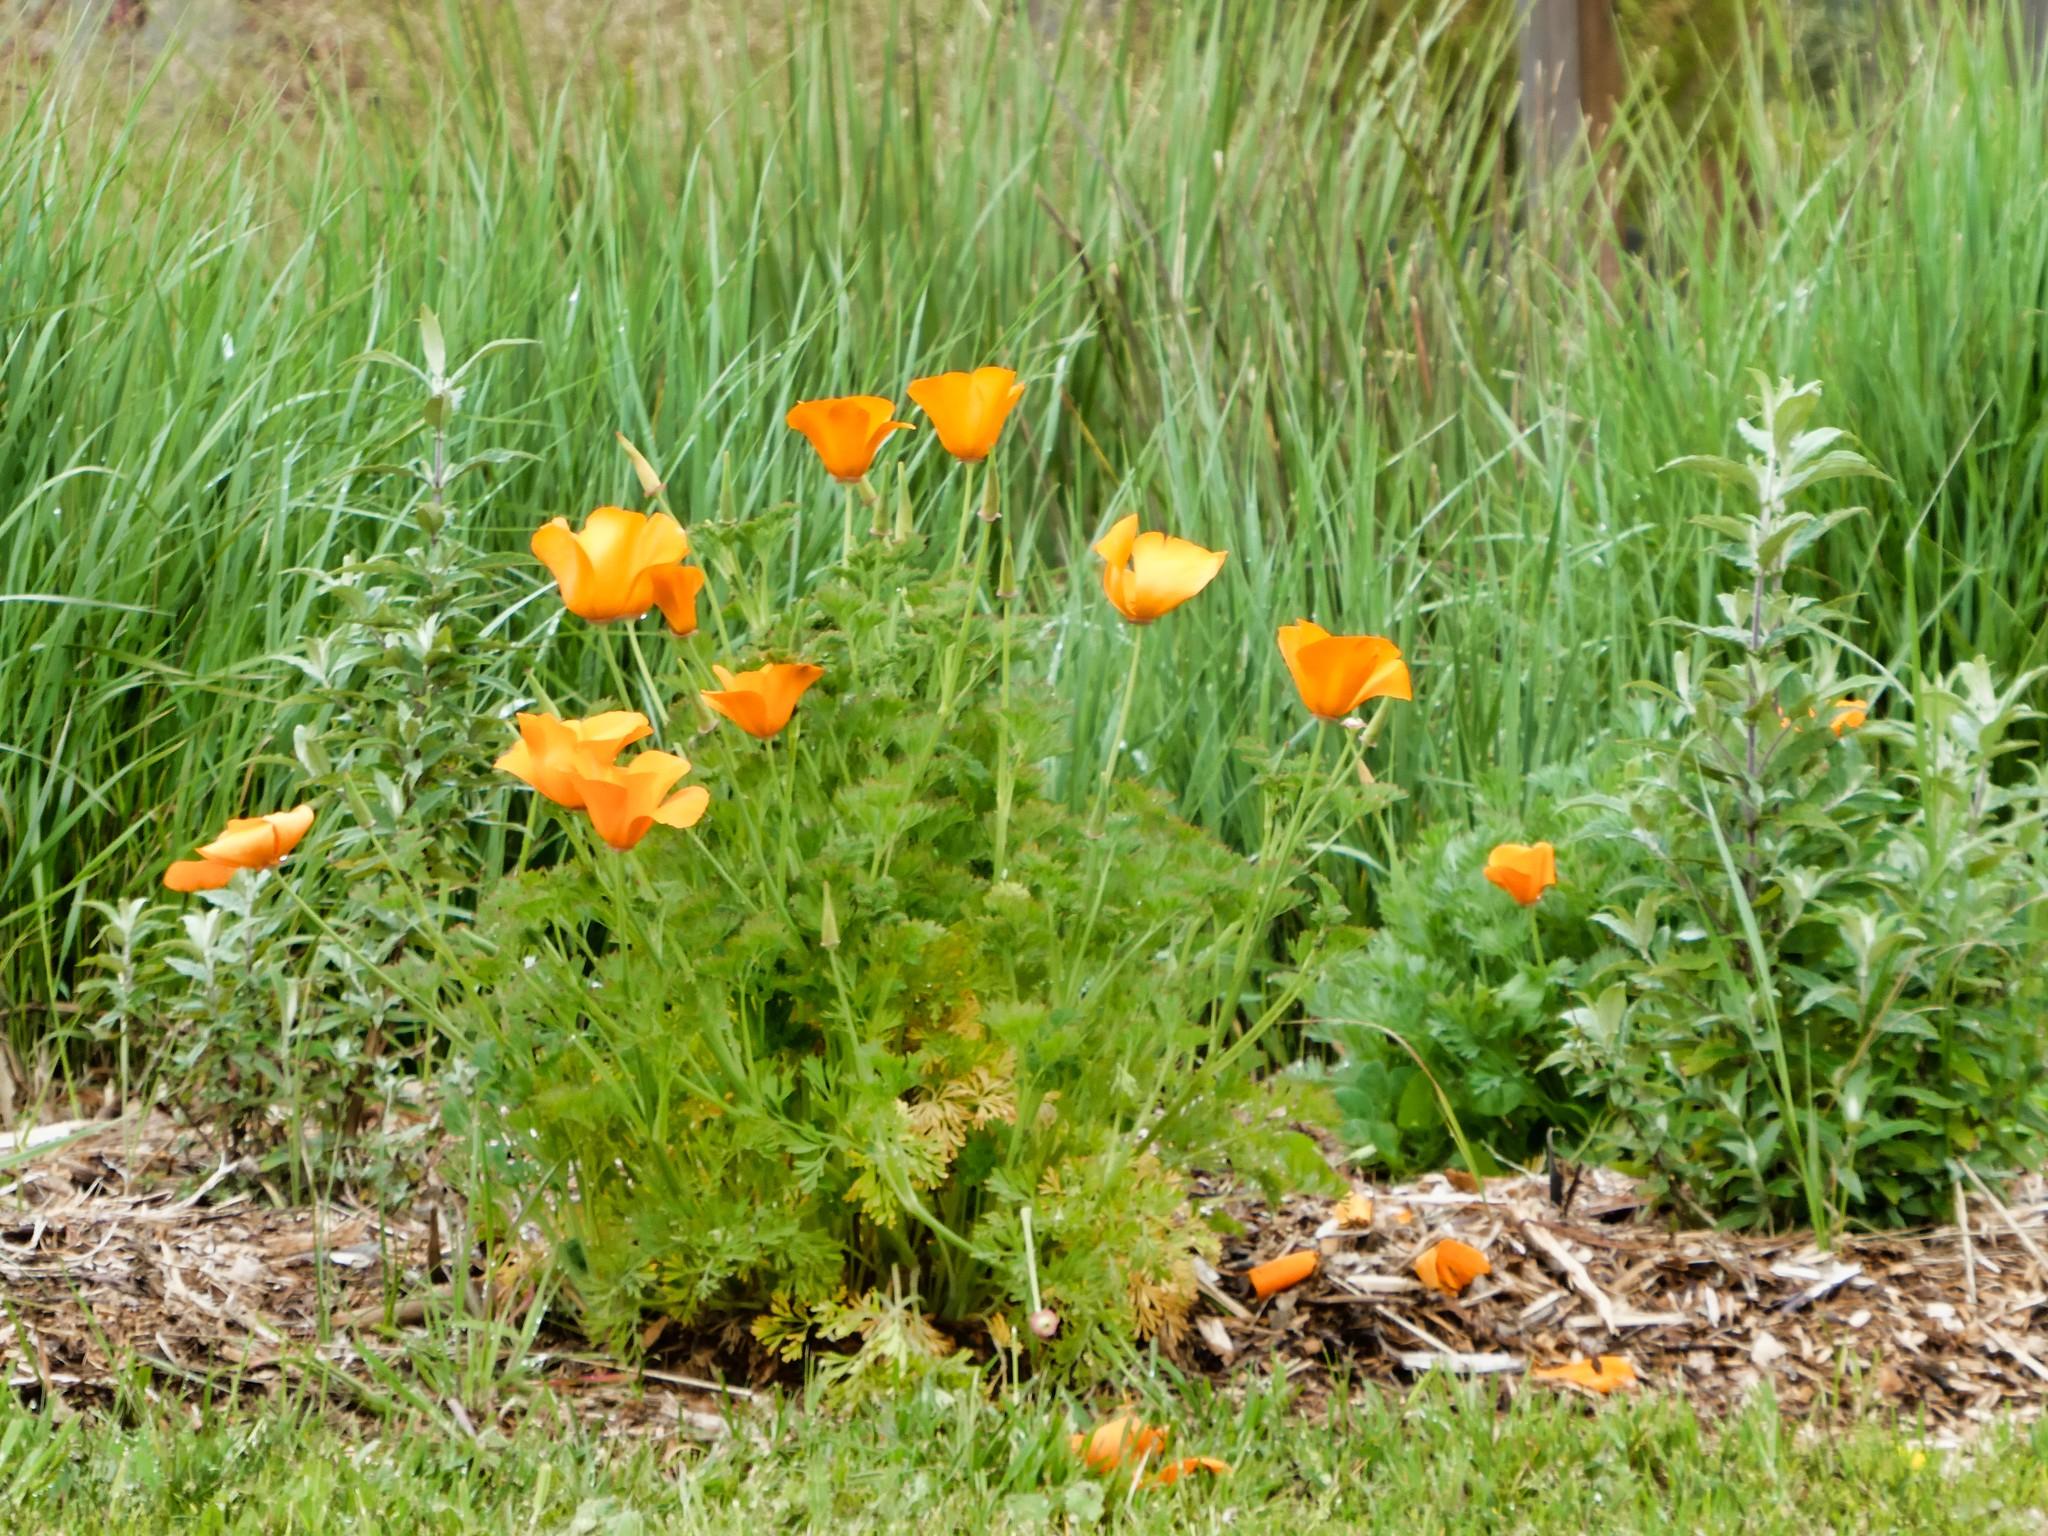 2019-04-06 - Outdoor Photography - Nature - Cornerstone Sonoma